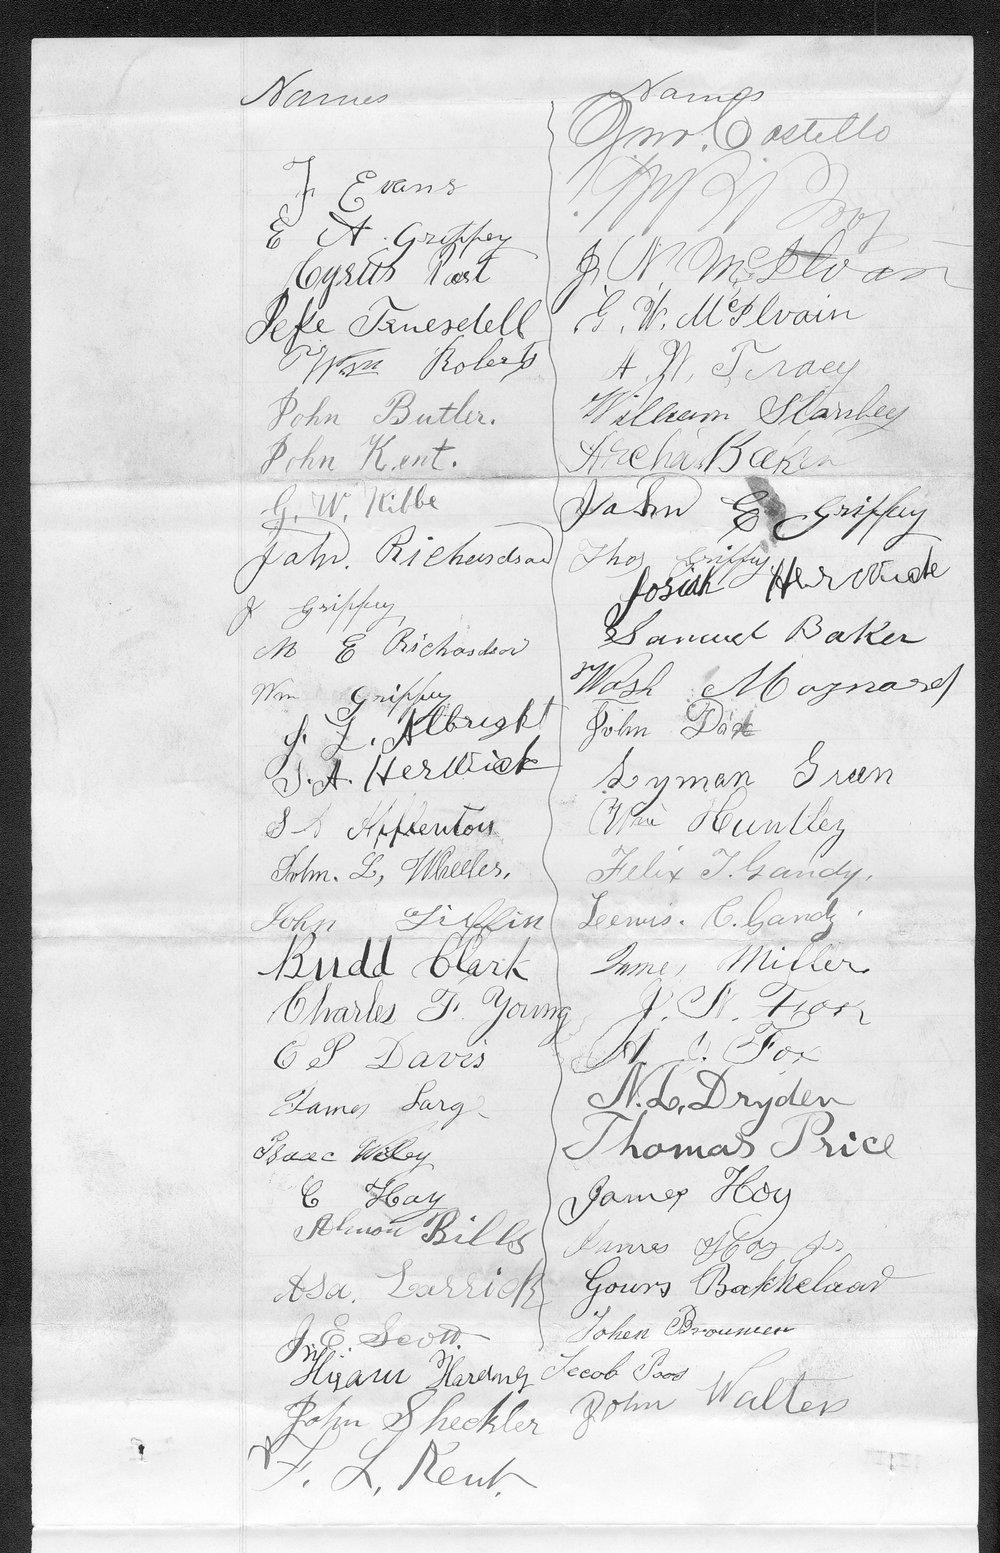 Phillips County organization records - 5